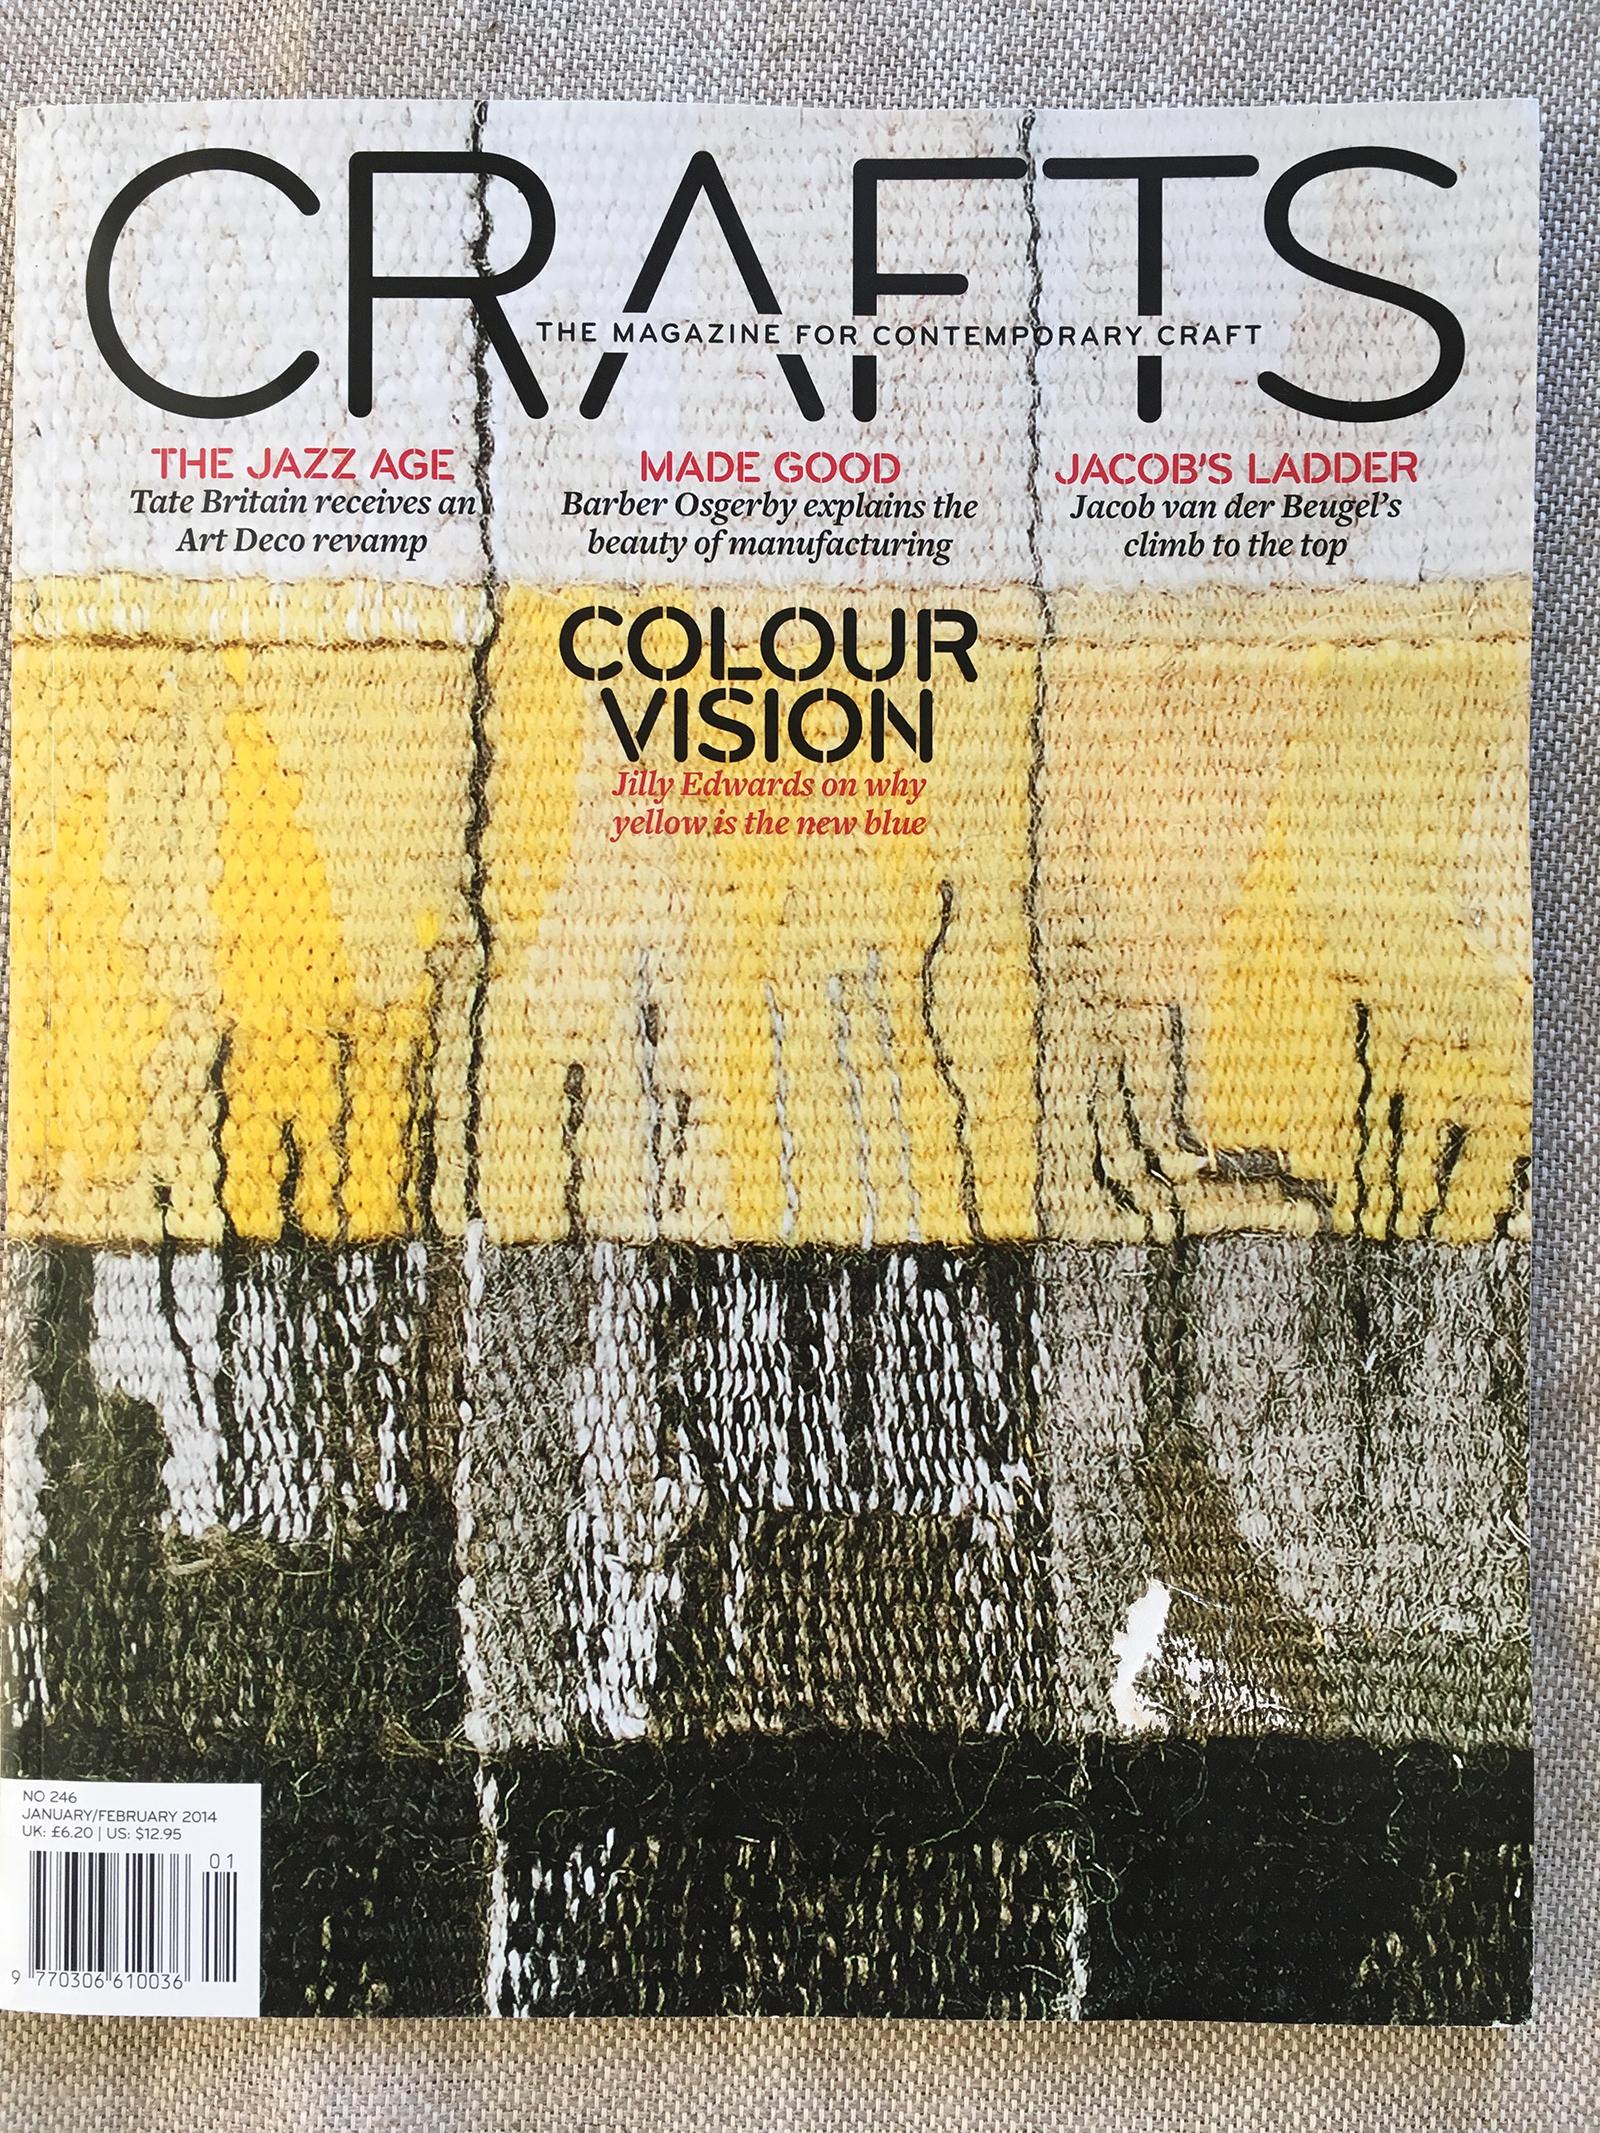 >> Crafts Magazine 2014